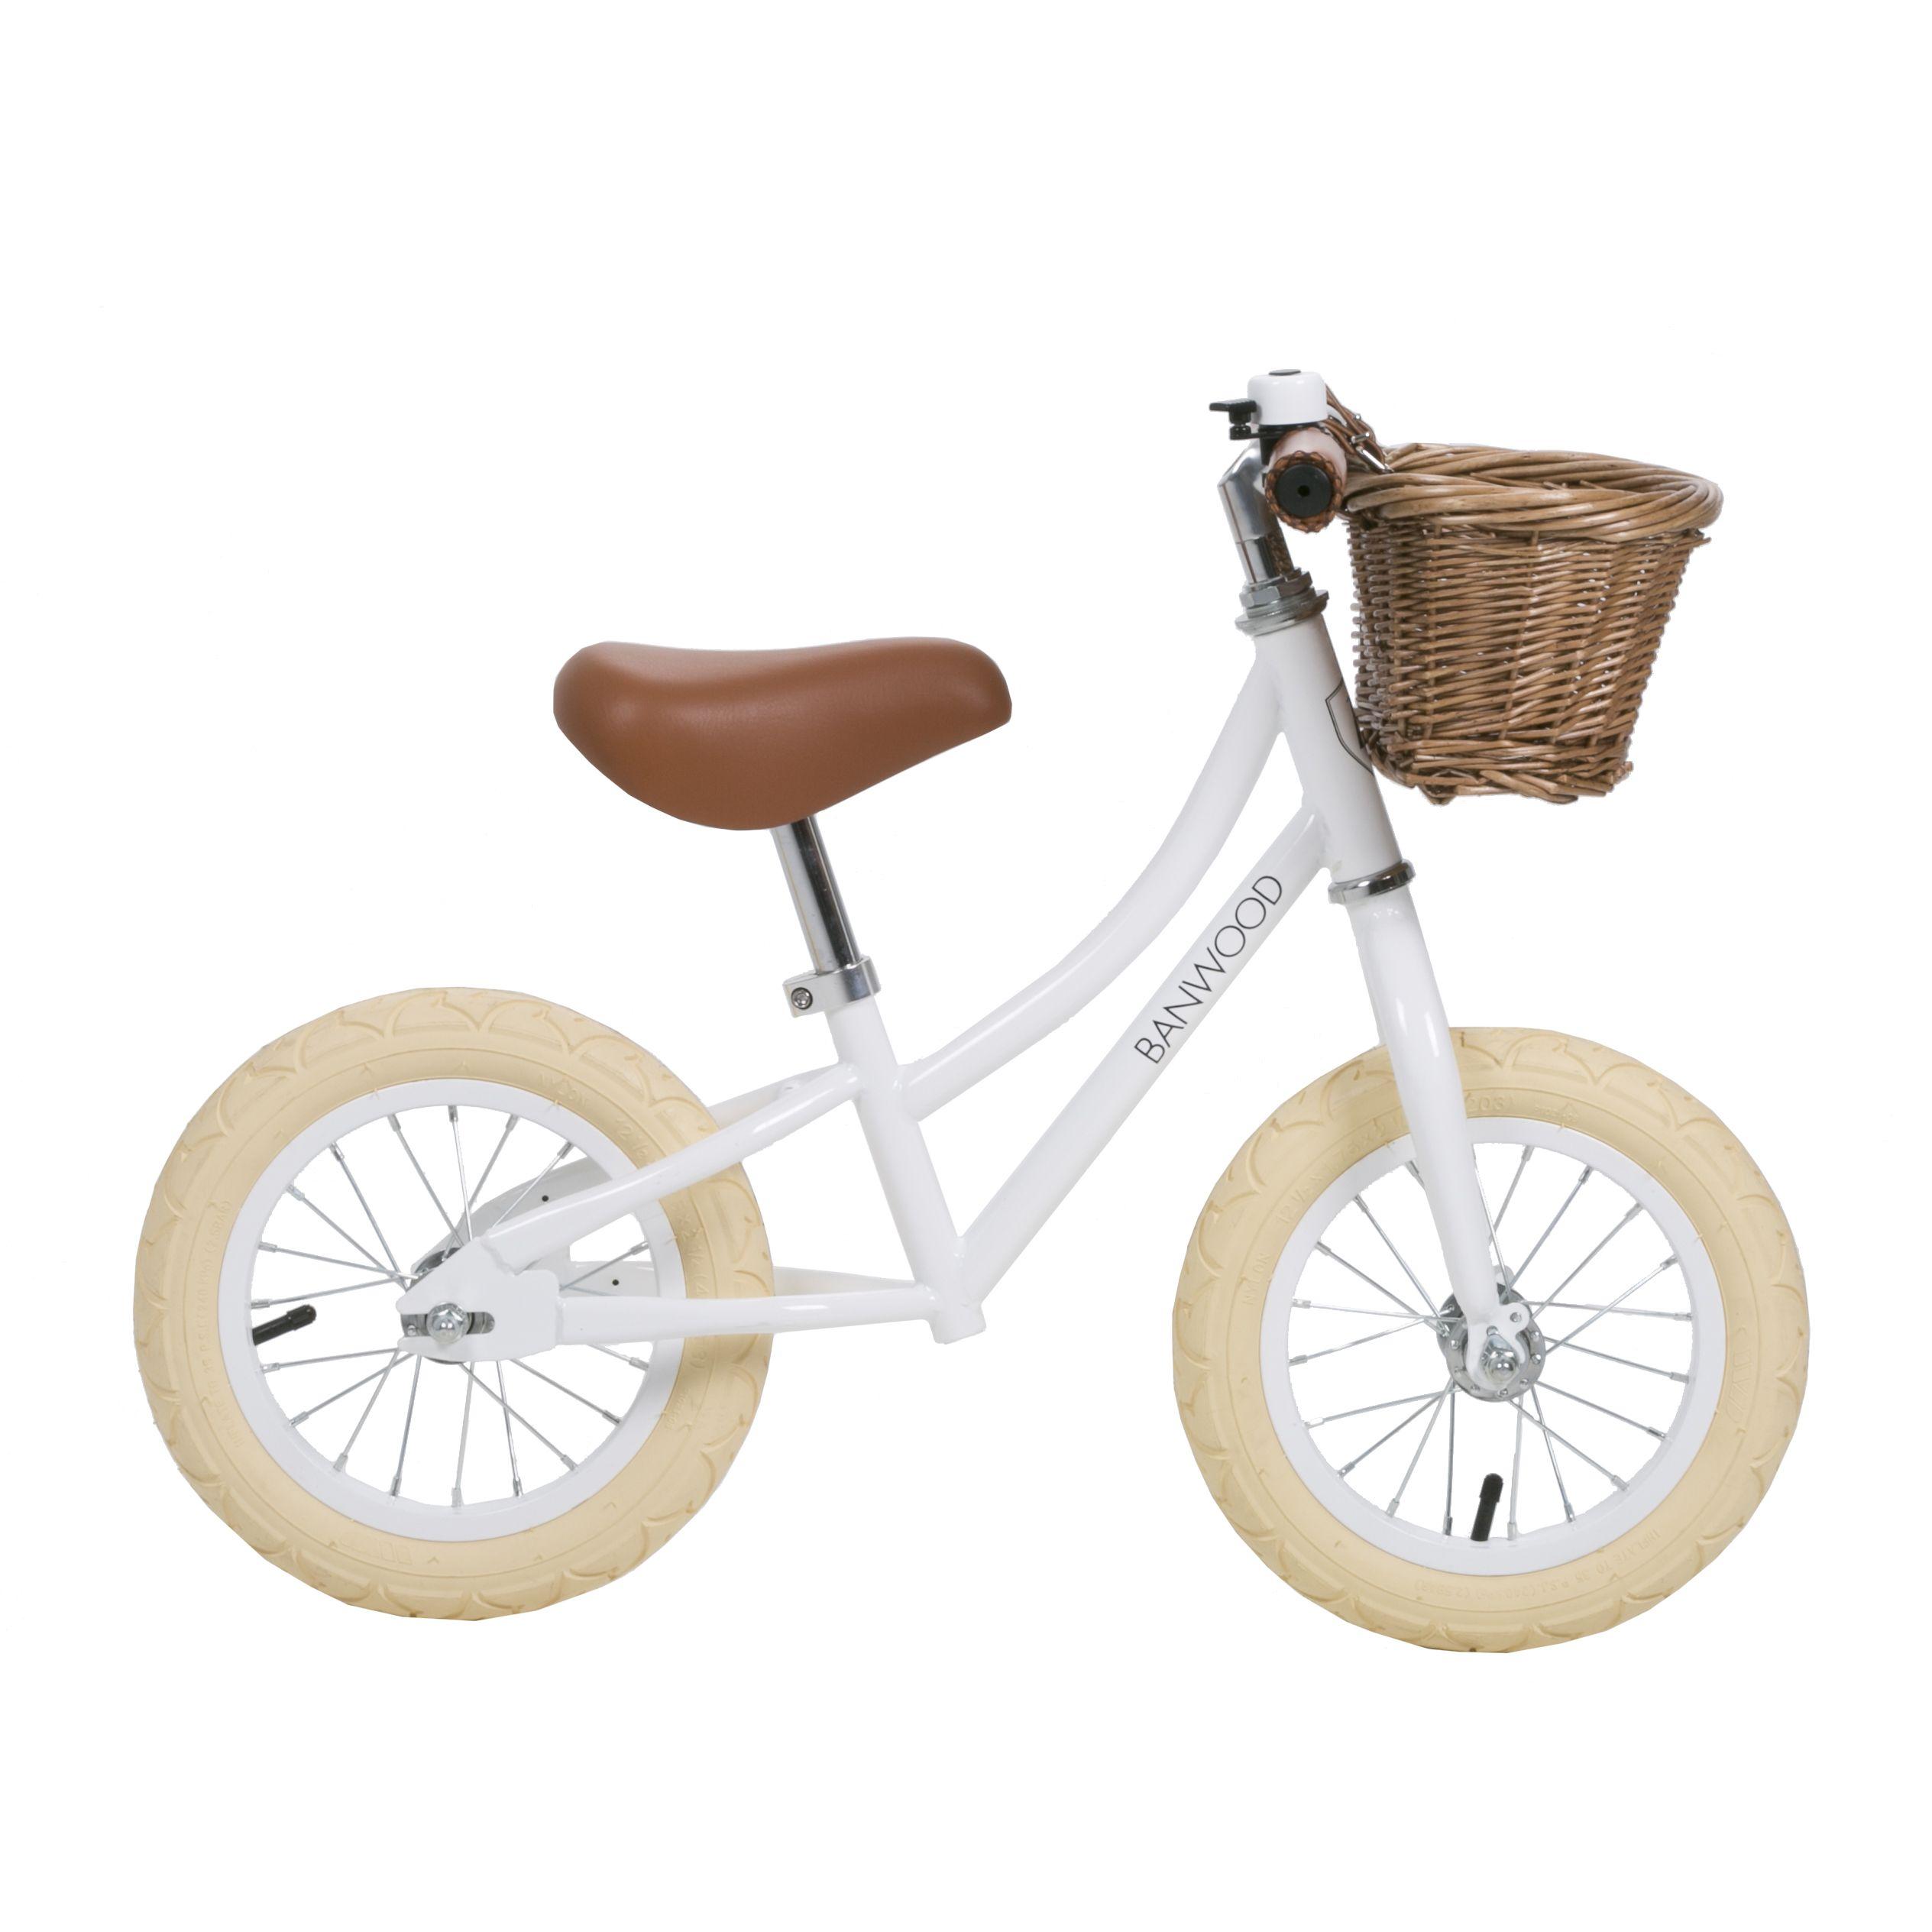 Banwood First Go Balance Bike White Bike Balance Bike Bike